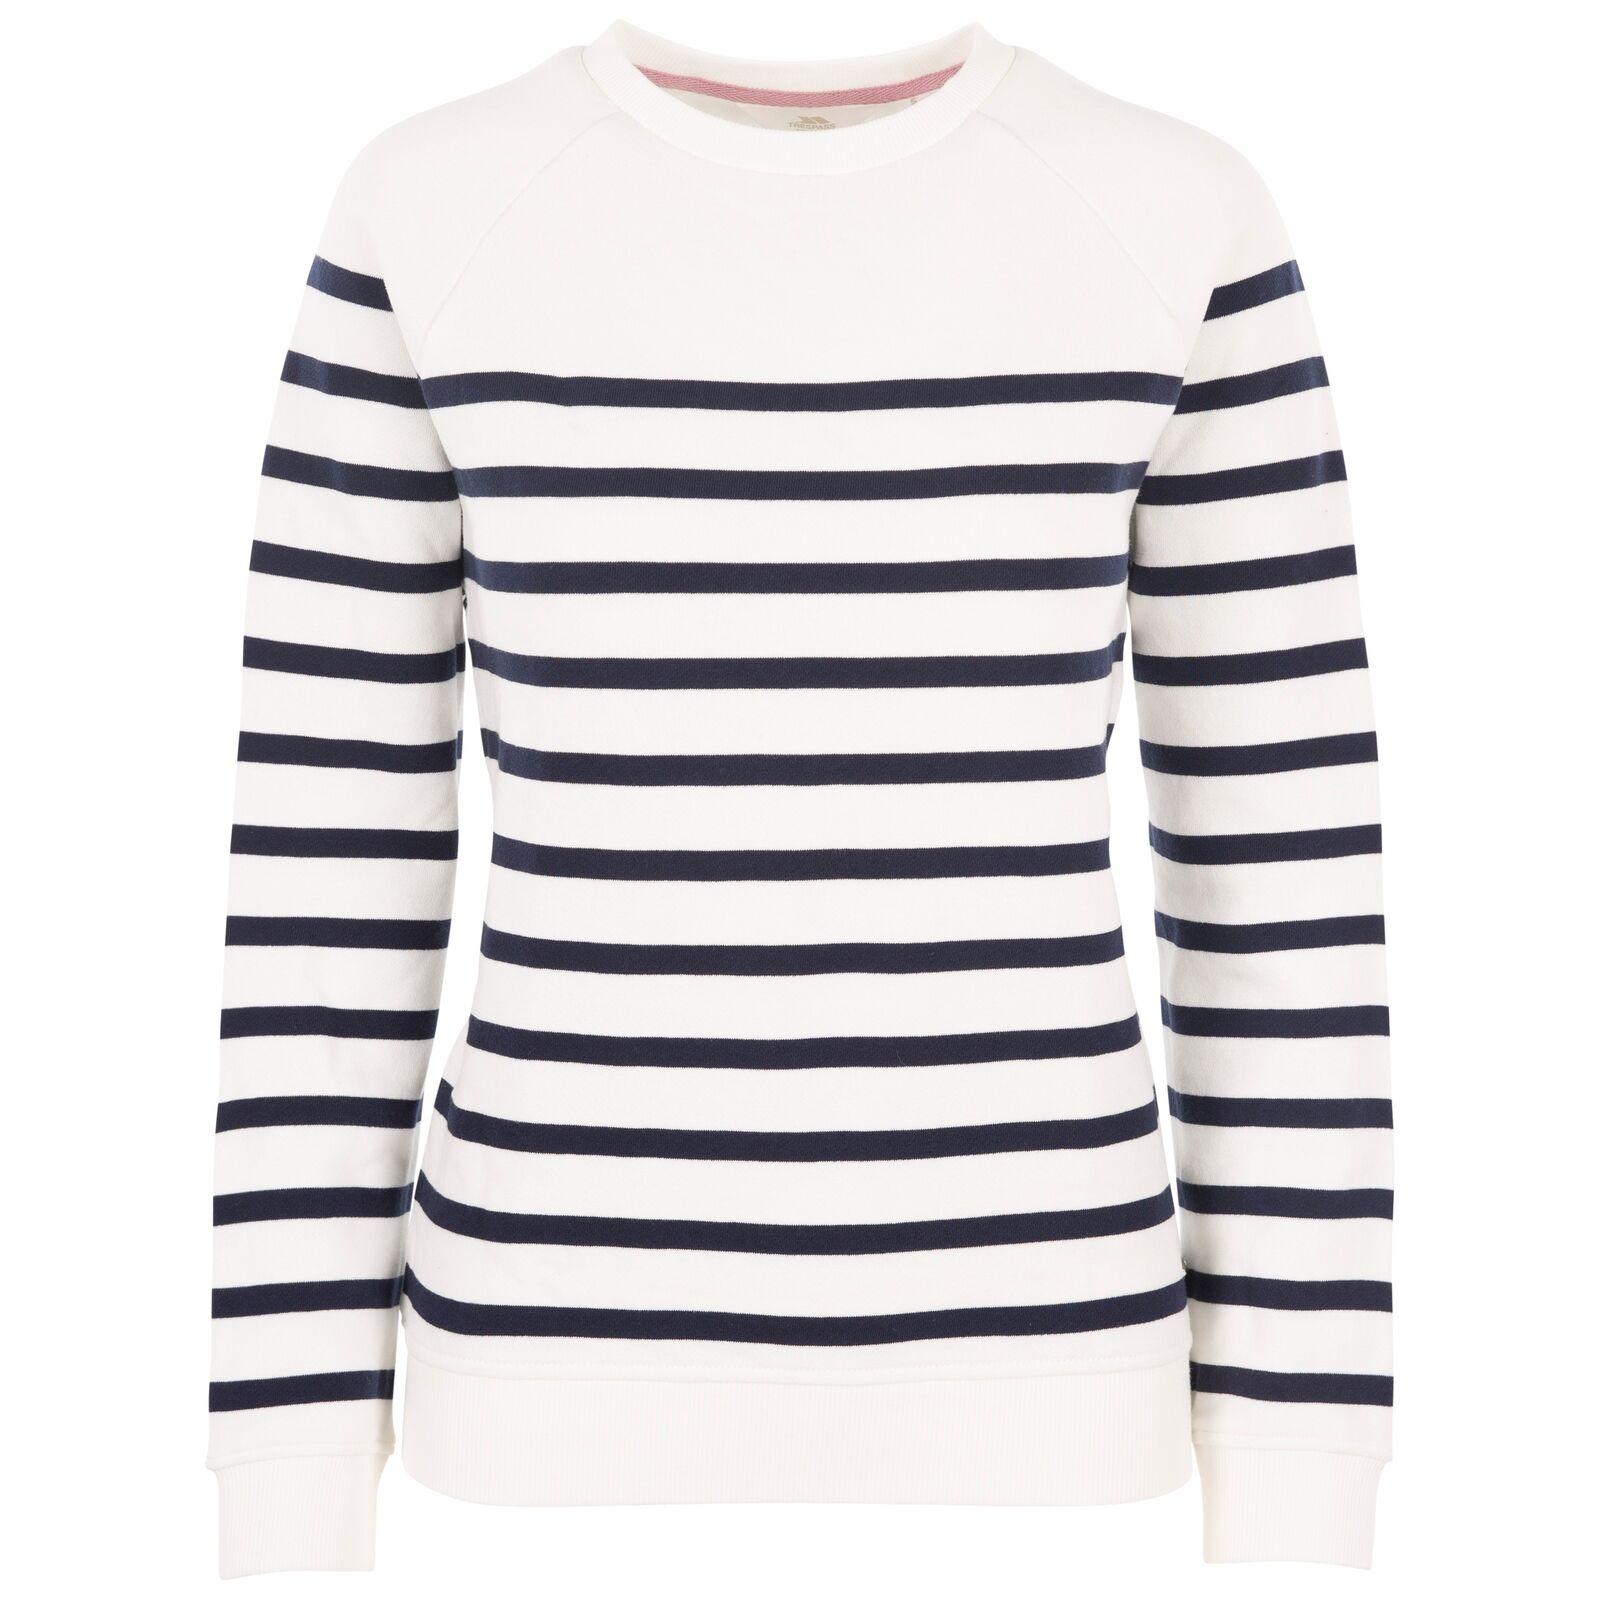 Trespass Womens Sweatshirt Casual Yarn Dyed Striped Chloe